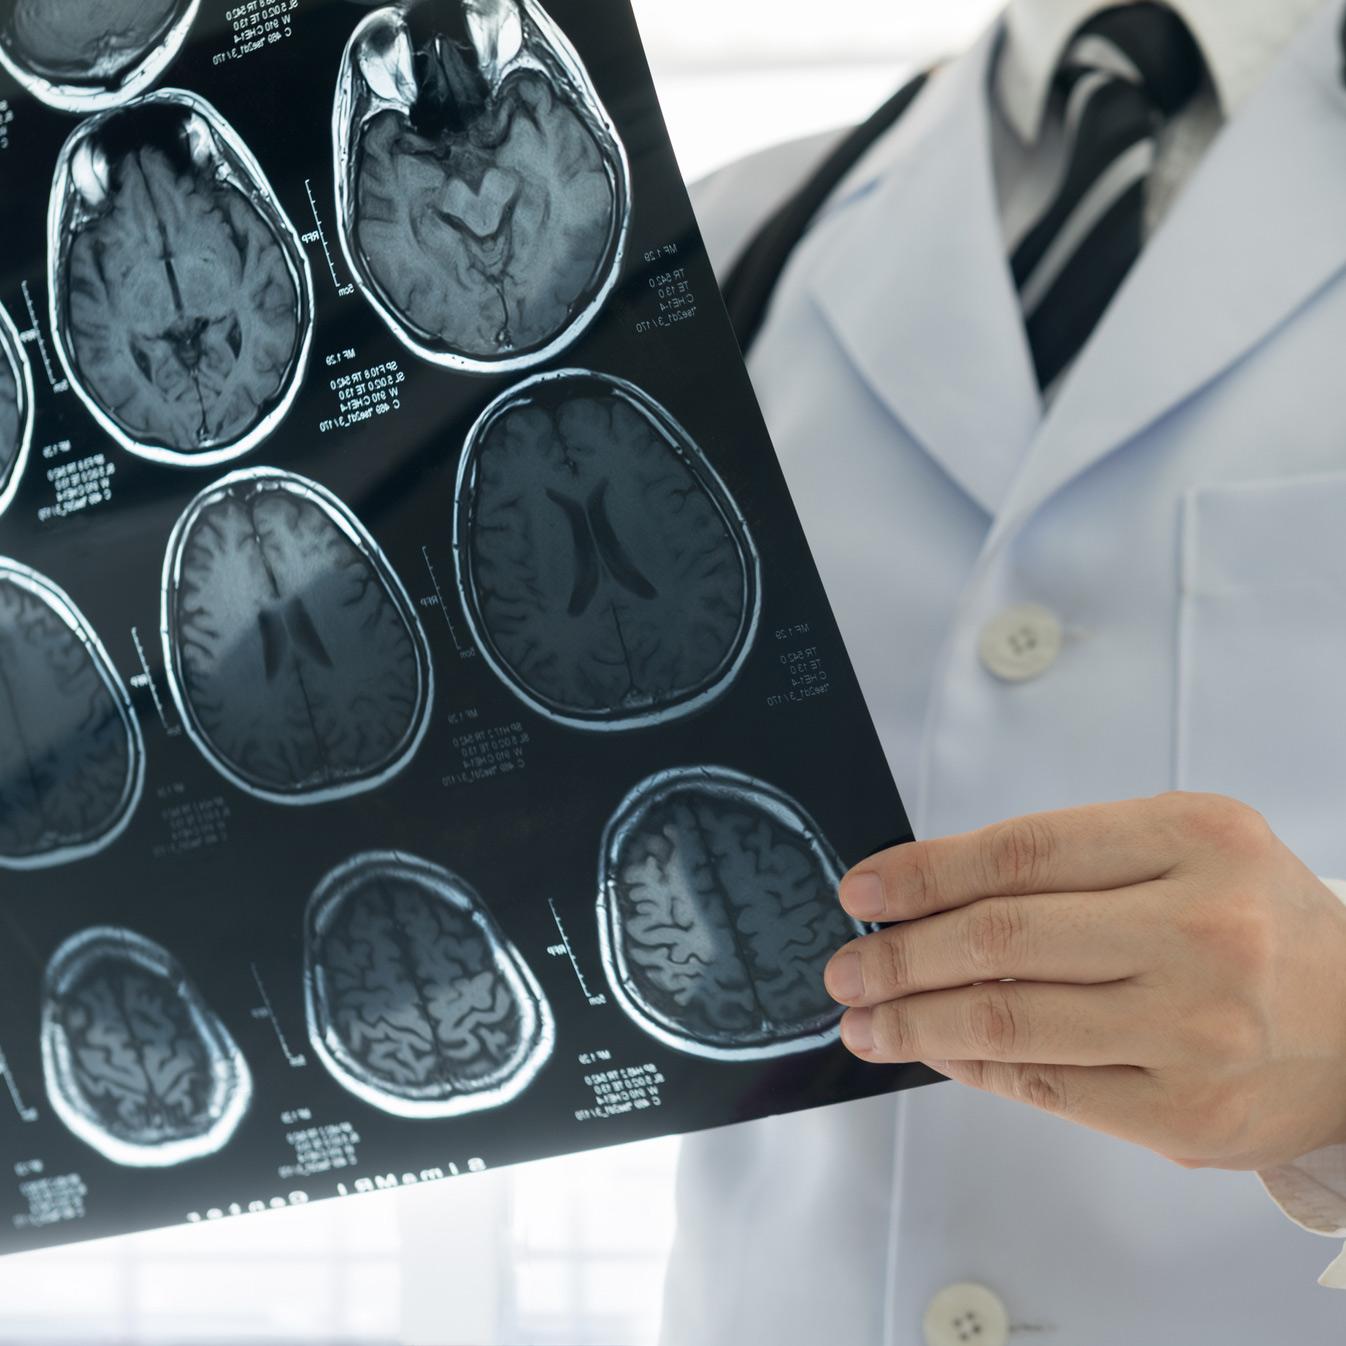 Study, new technique help personalize acoustic neuroma surgery decision -